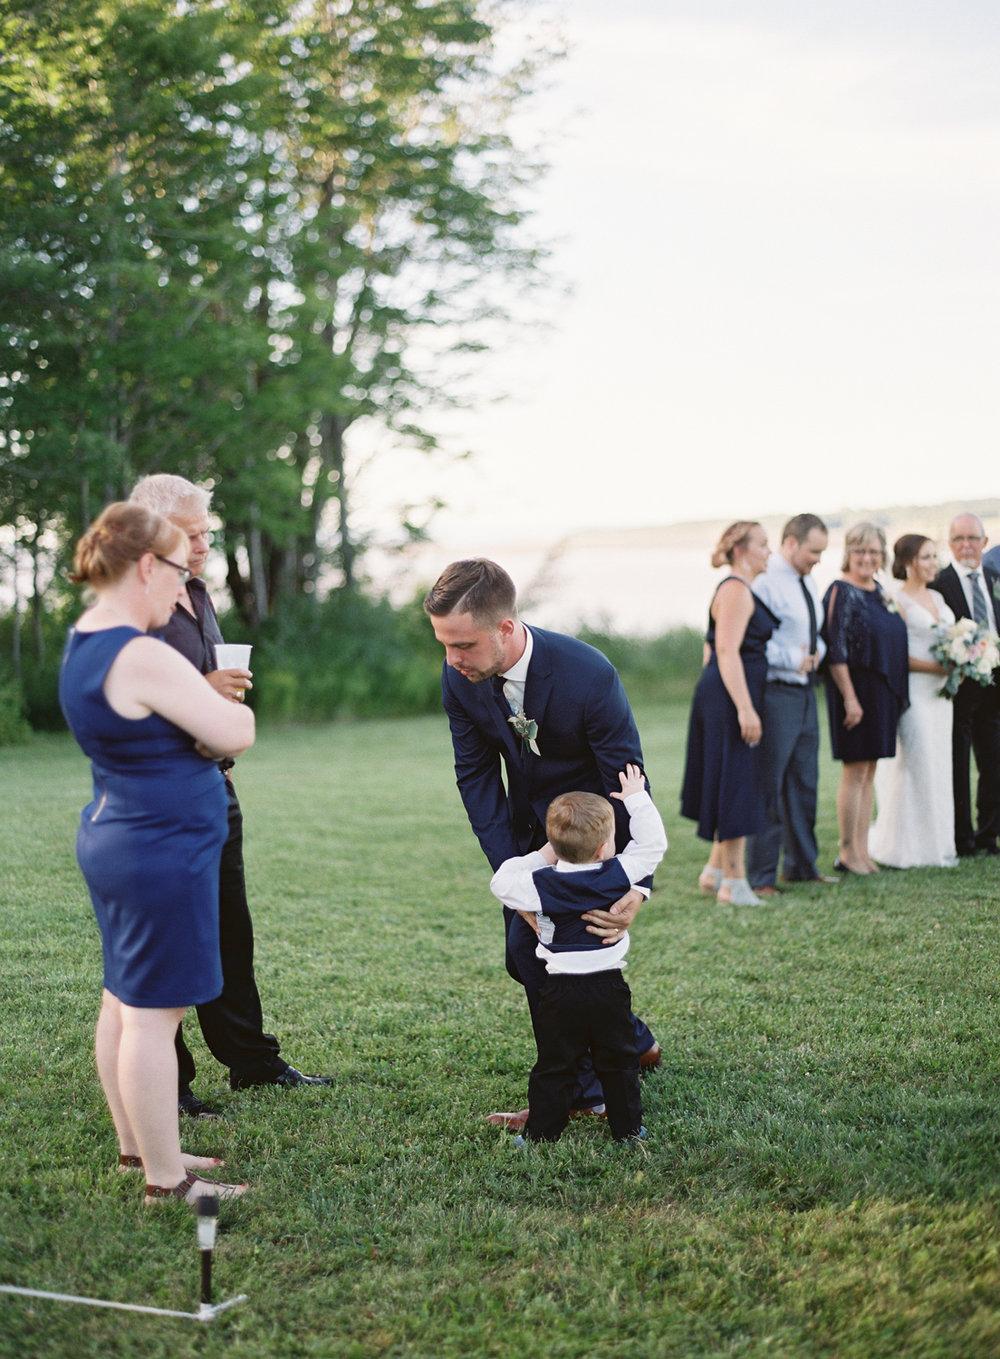 Jacqueline Anne Photography - Nova Scotia Backyard Wedding-56.jpg